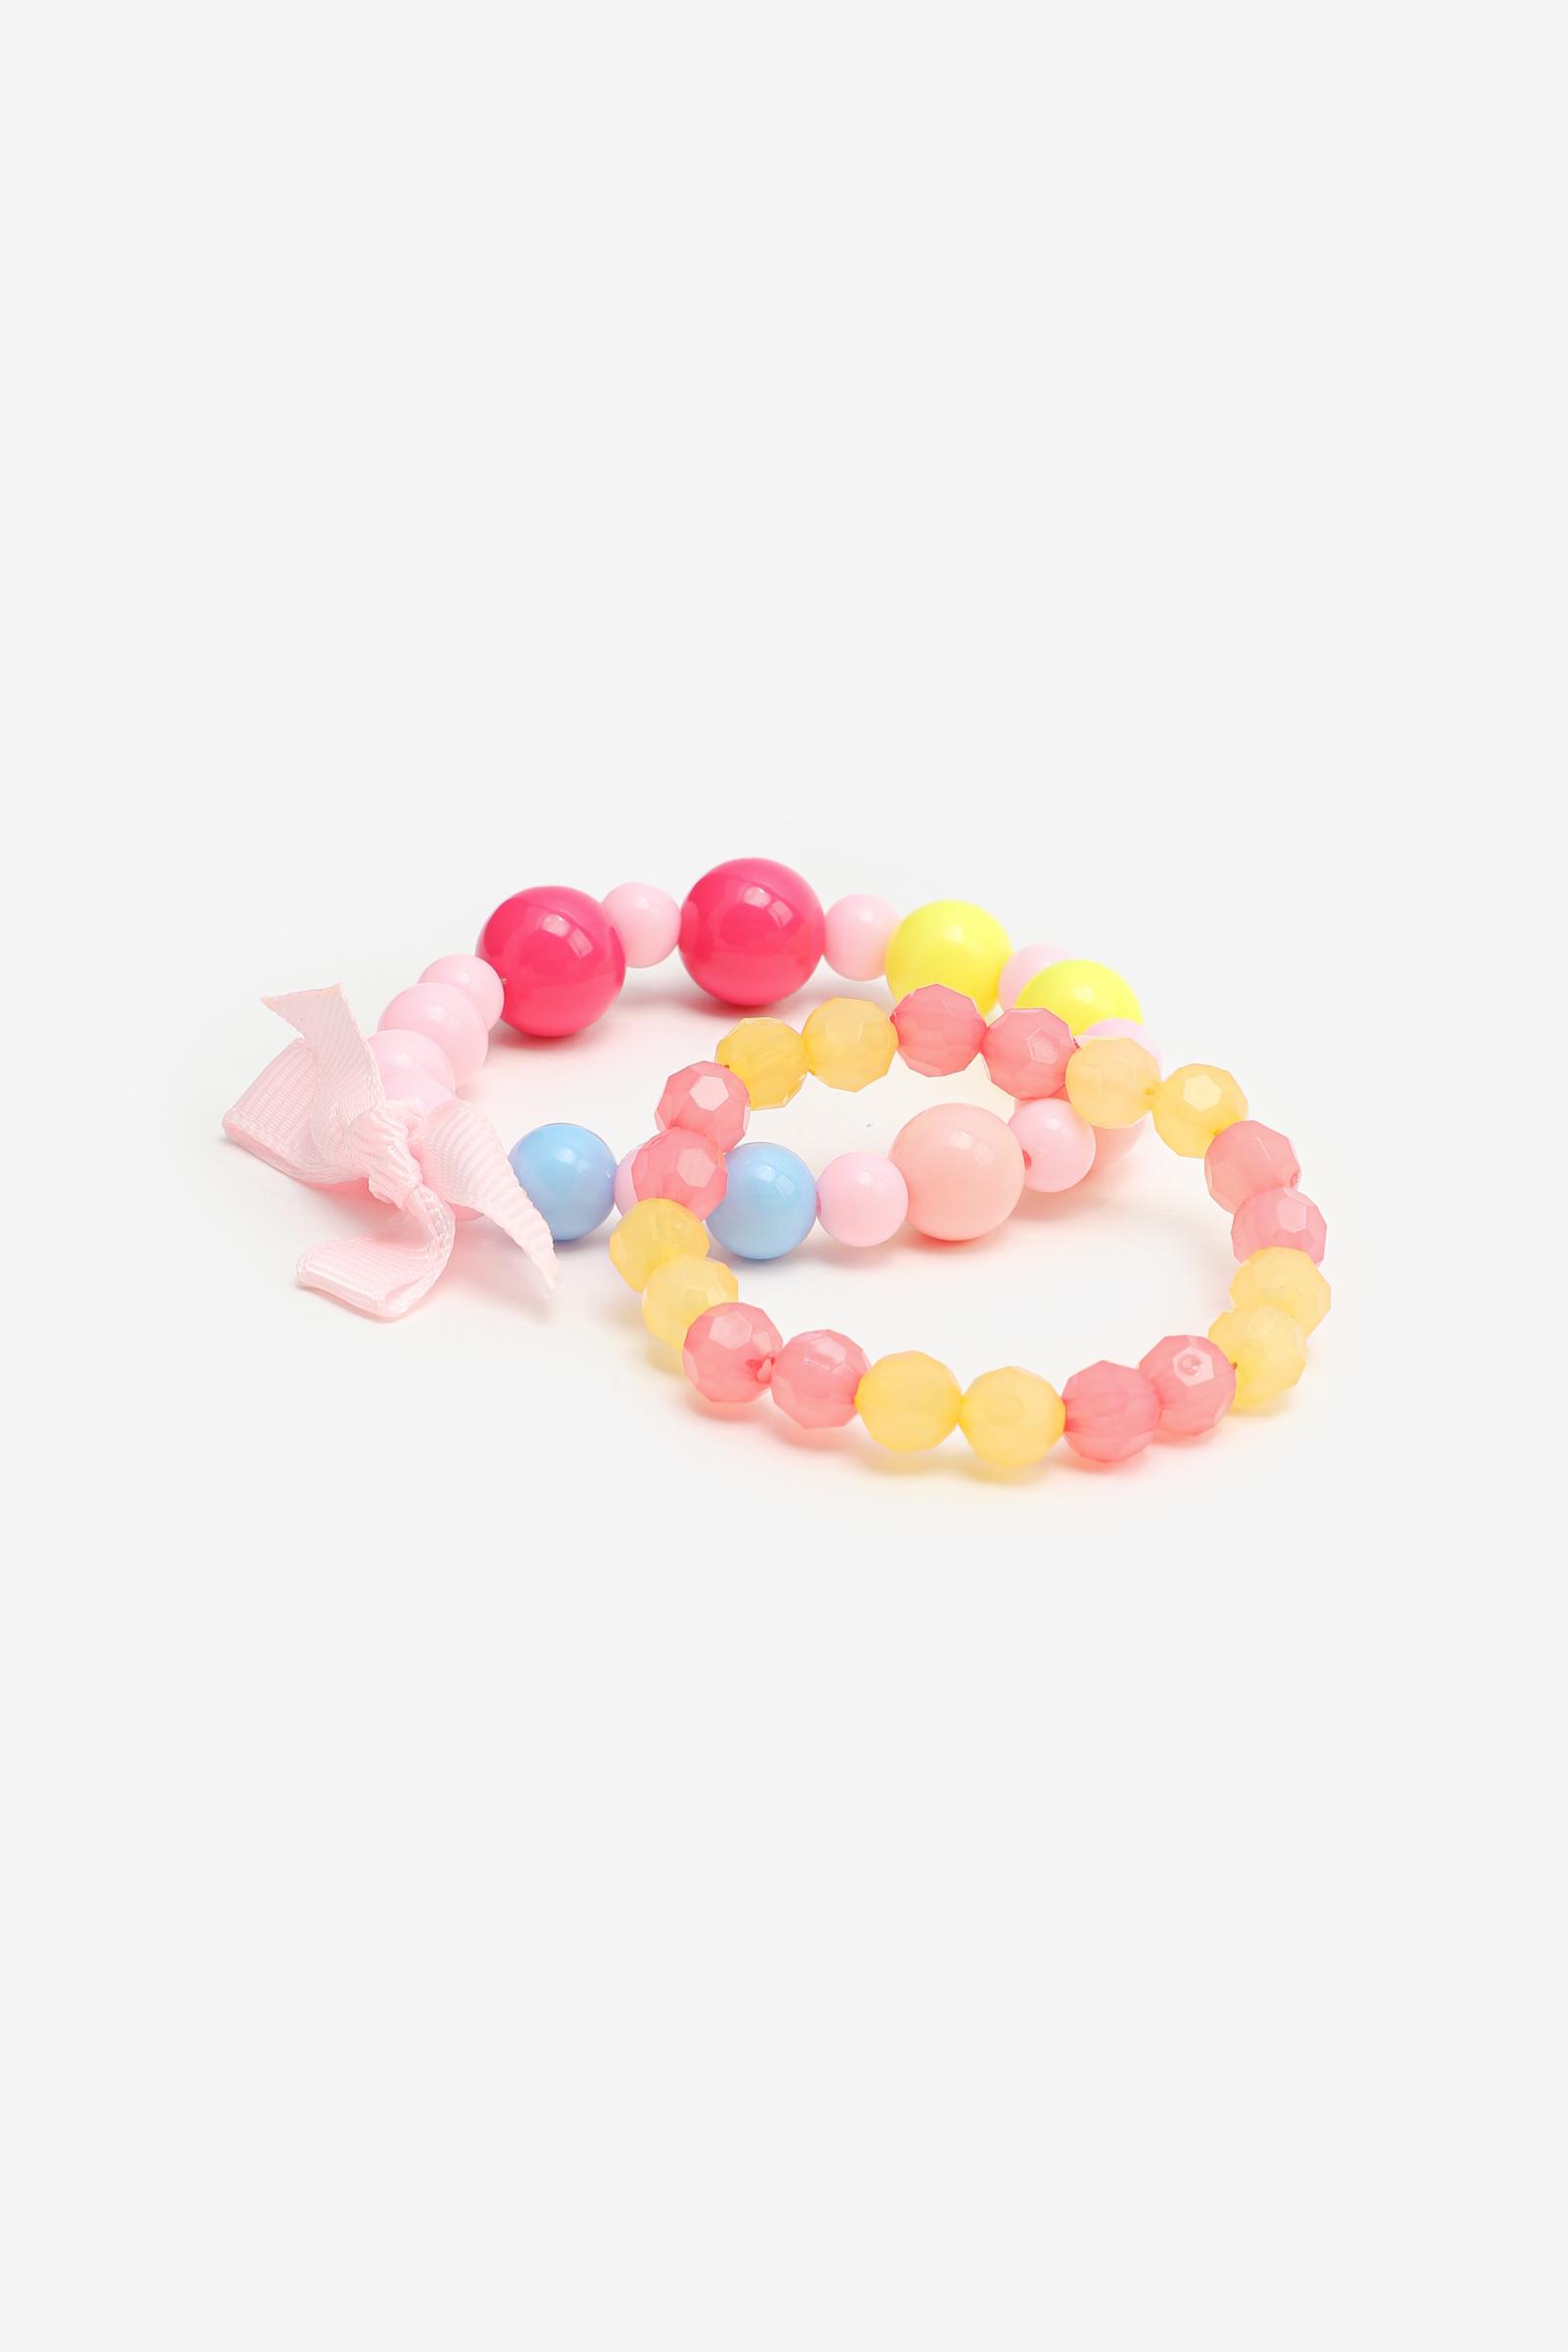 2-Pack Colorful Bracelets for Girls